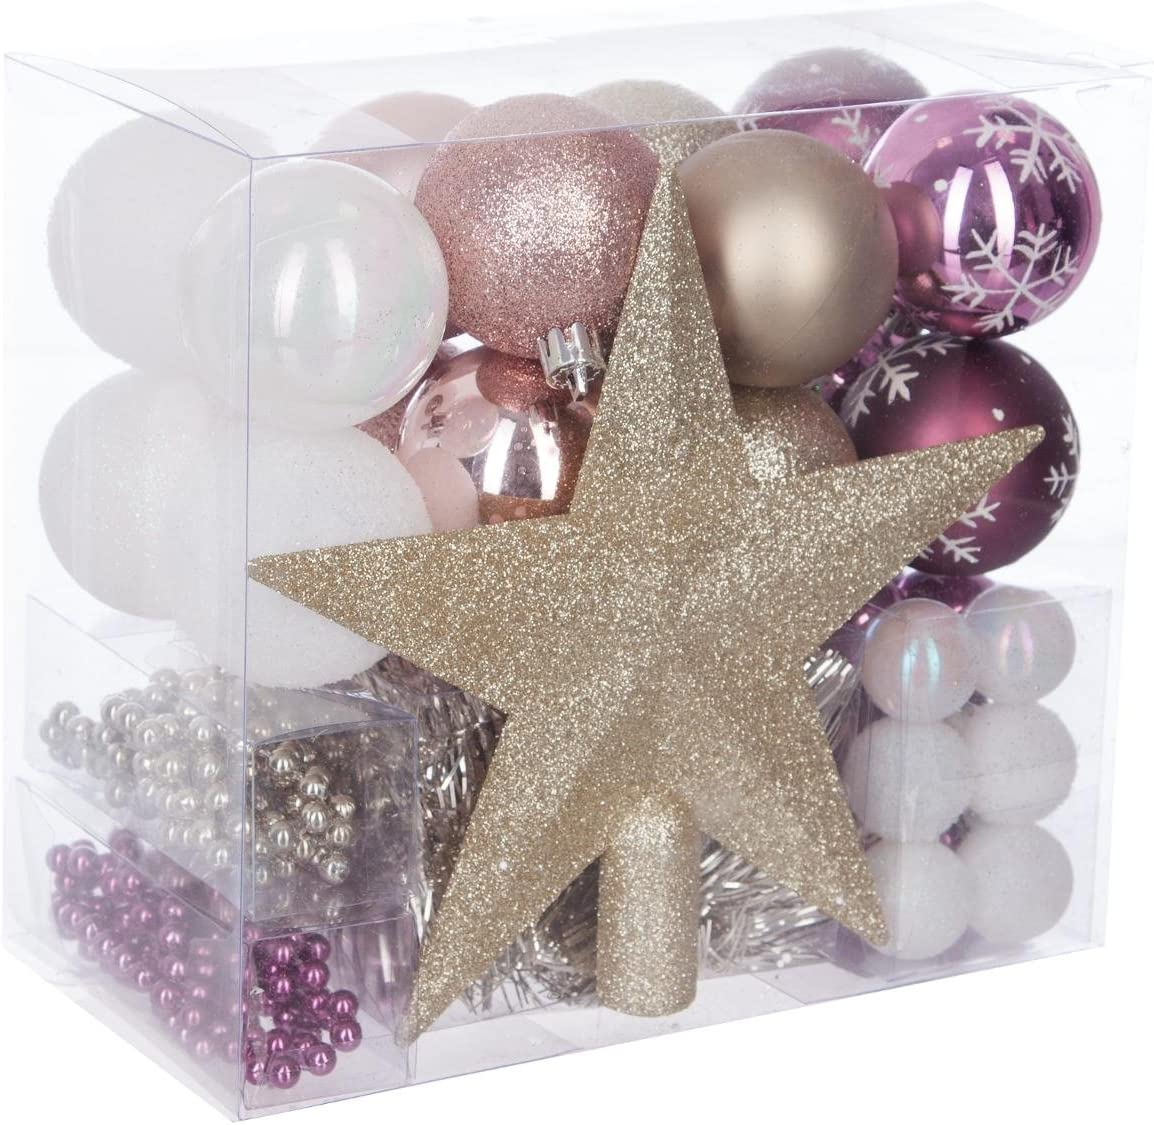 Christmas-Decorations Lot de 16 boules de No/ël en verre Rose fuchsia 35 mm